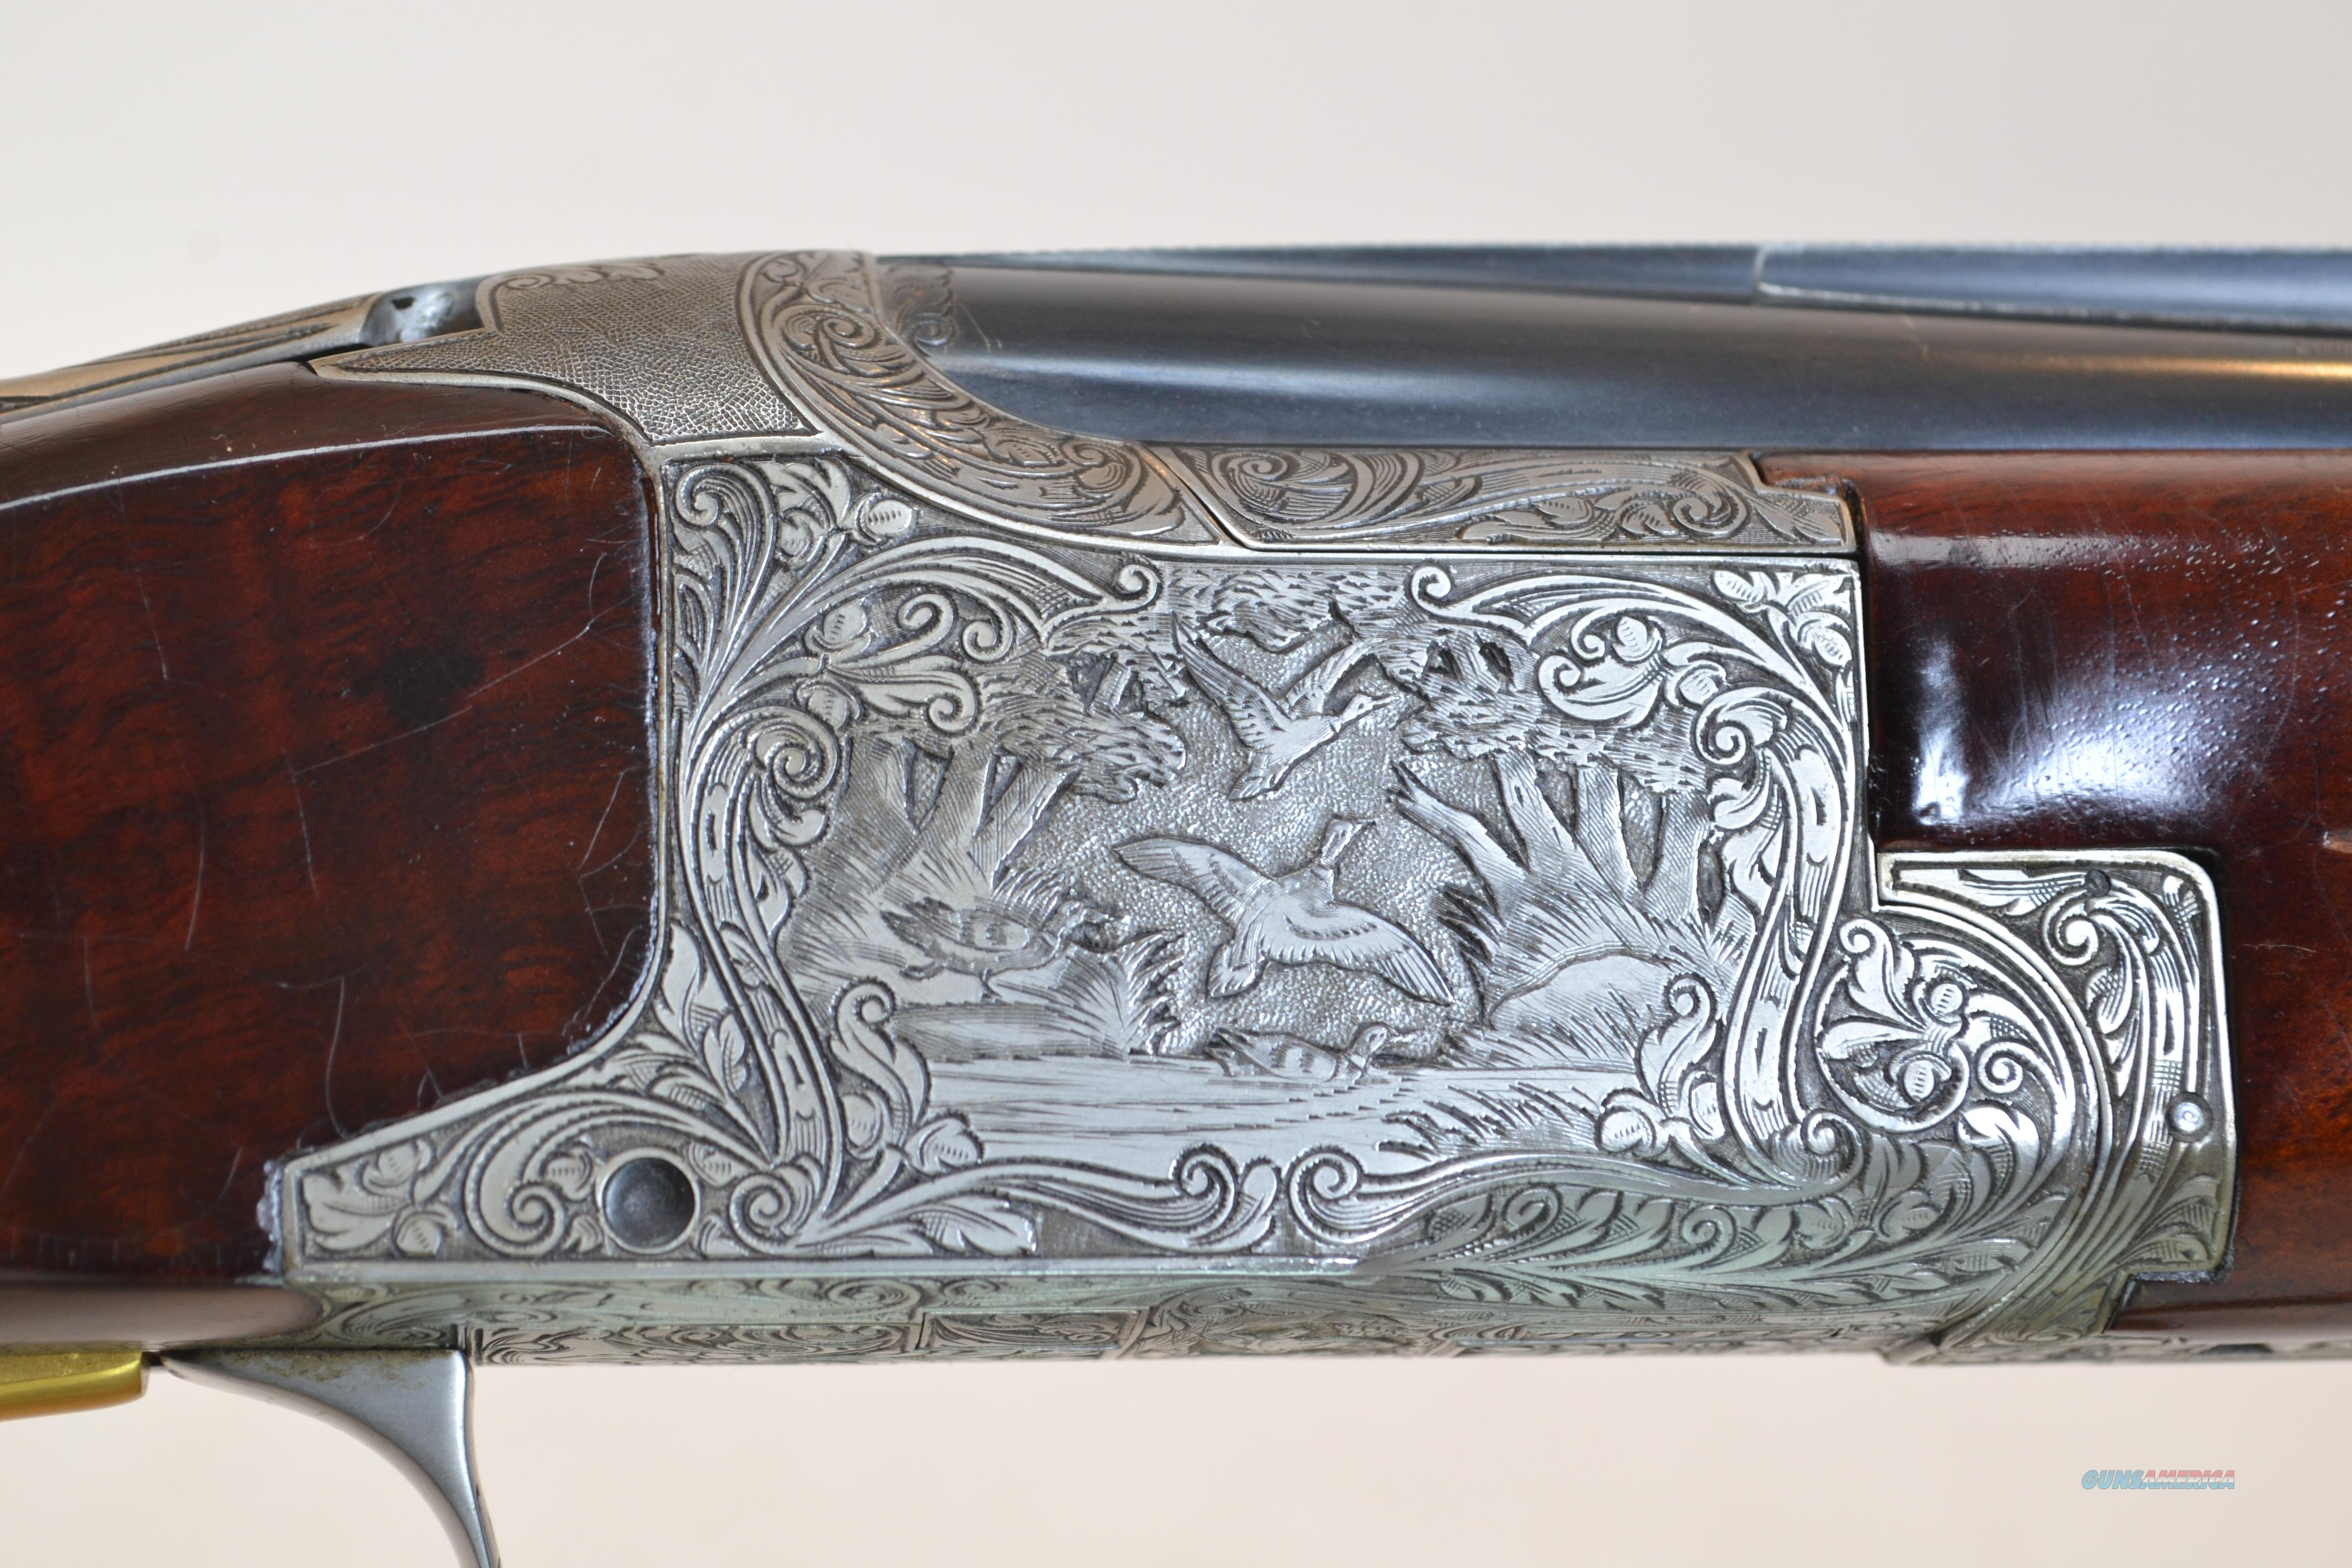 "Browning - Diana Superposed, 20ga. 28"" Barrels Choked SK/SK  Guns > Shotguns > Browning Shotguns > Over Unders > Belgian Manufacture"